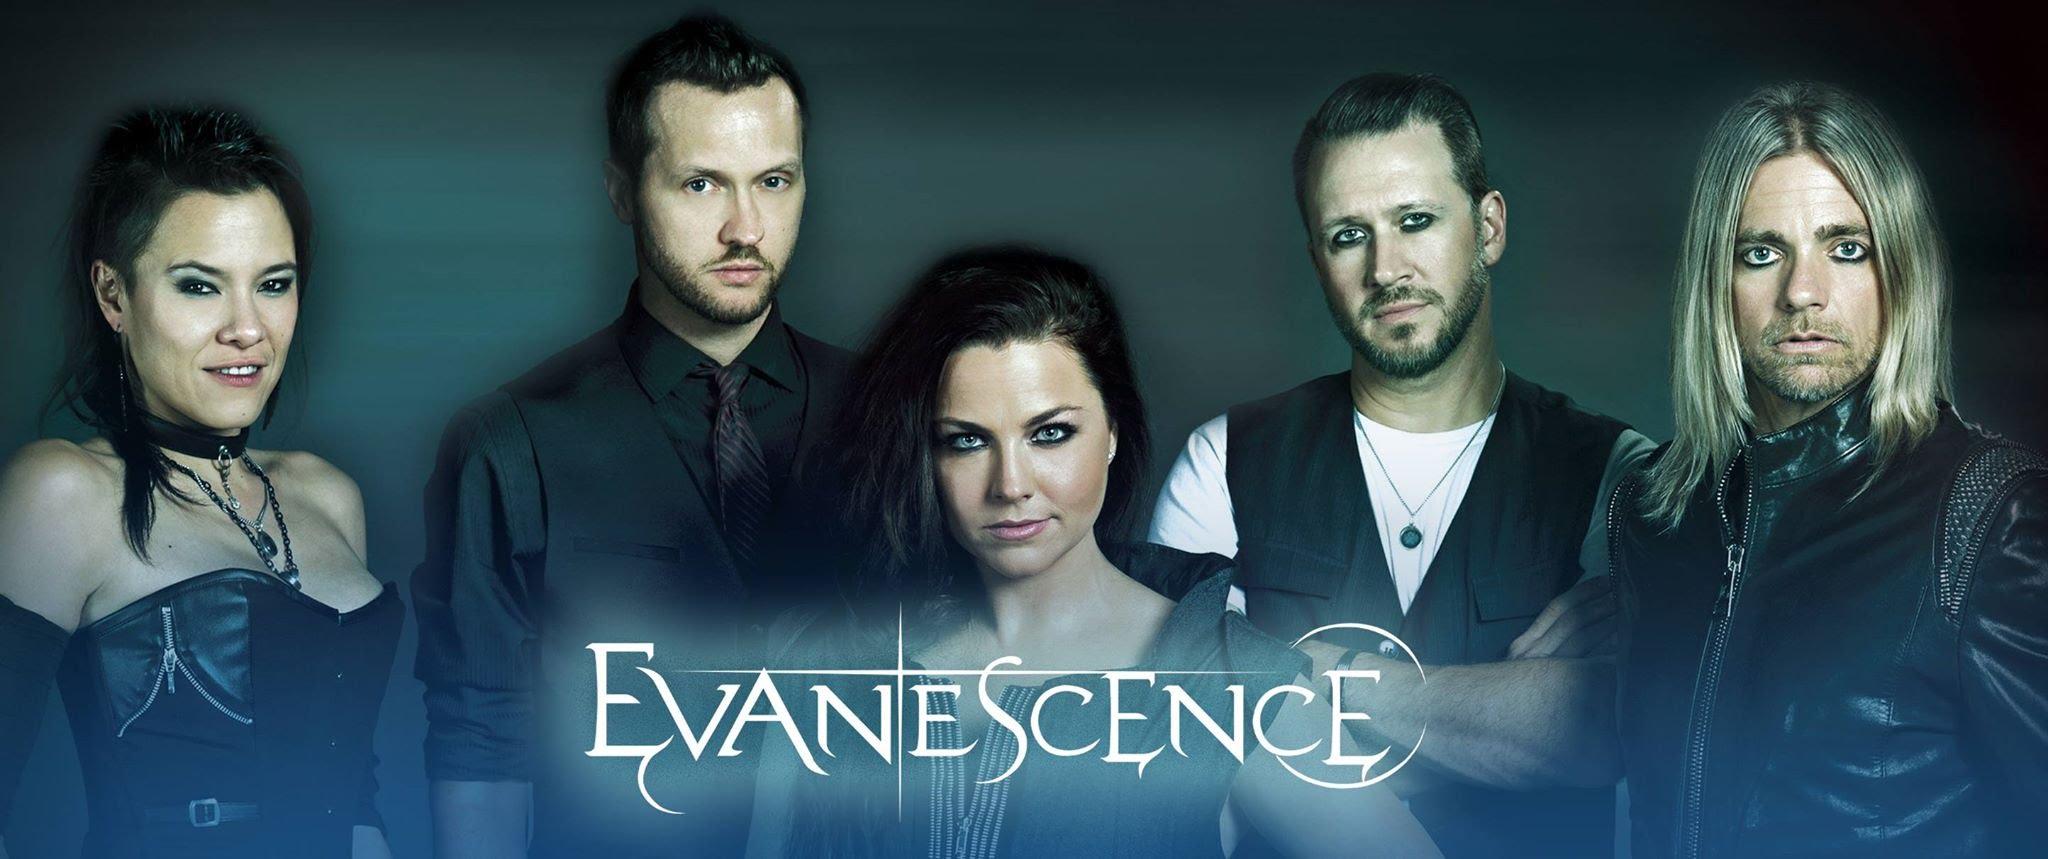 EvanescenceLive HOB Orlando 4 30 2016 2048x859